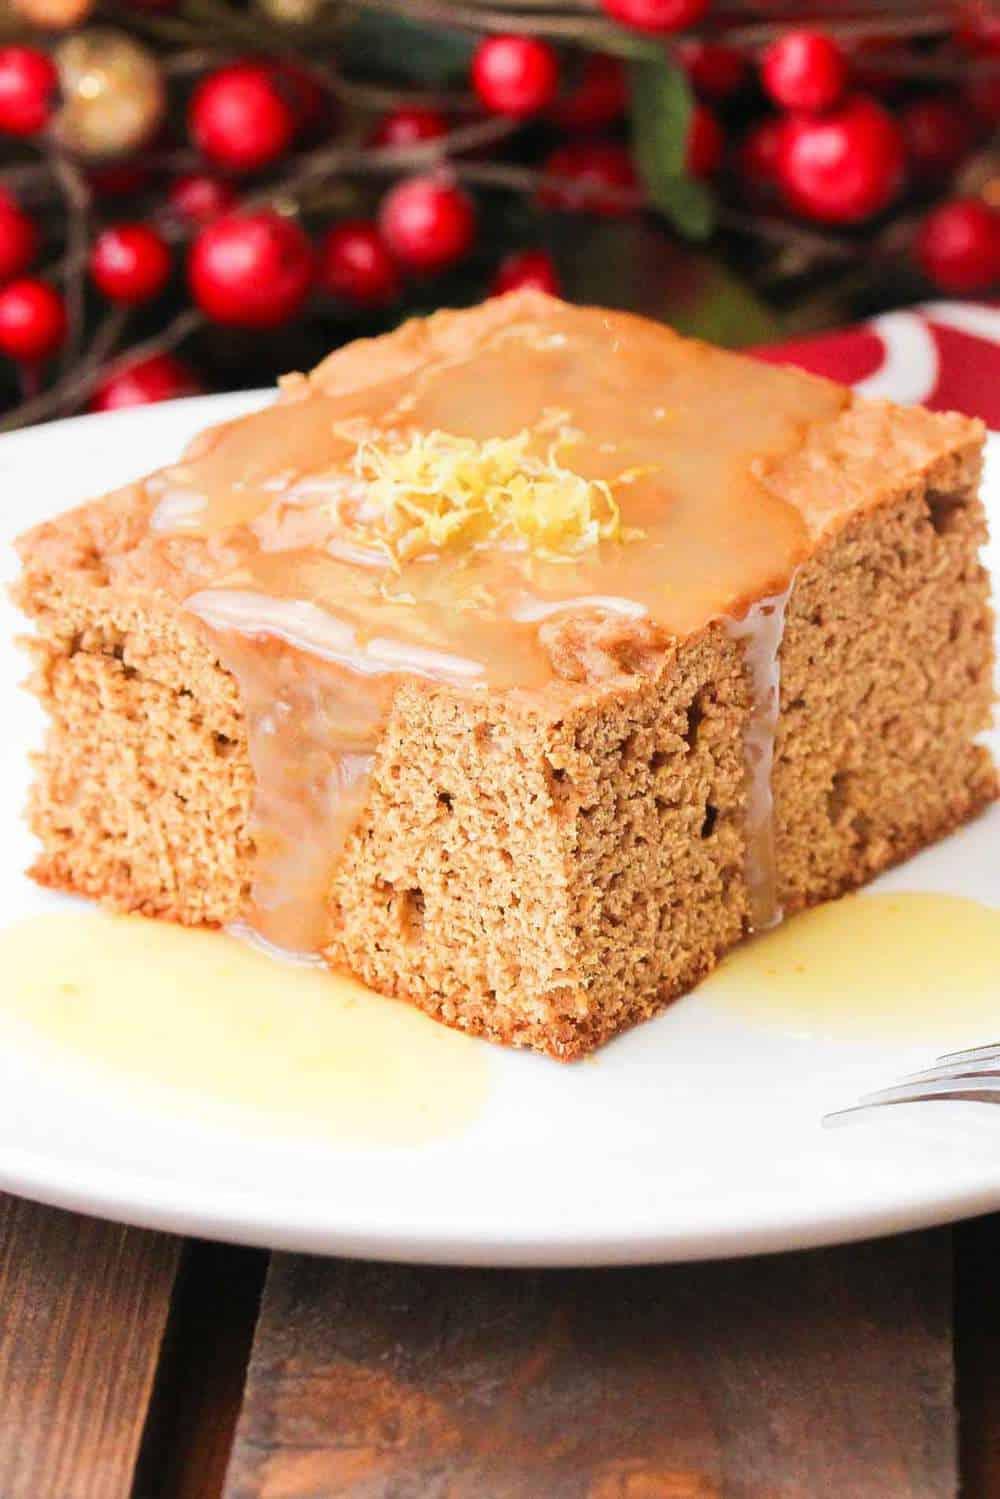 Gingerbread cake with lemon sauce recipe